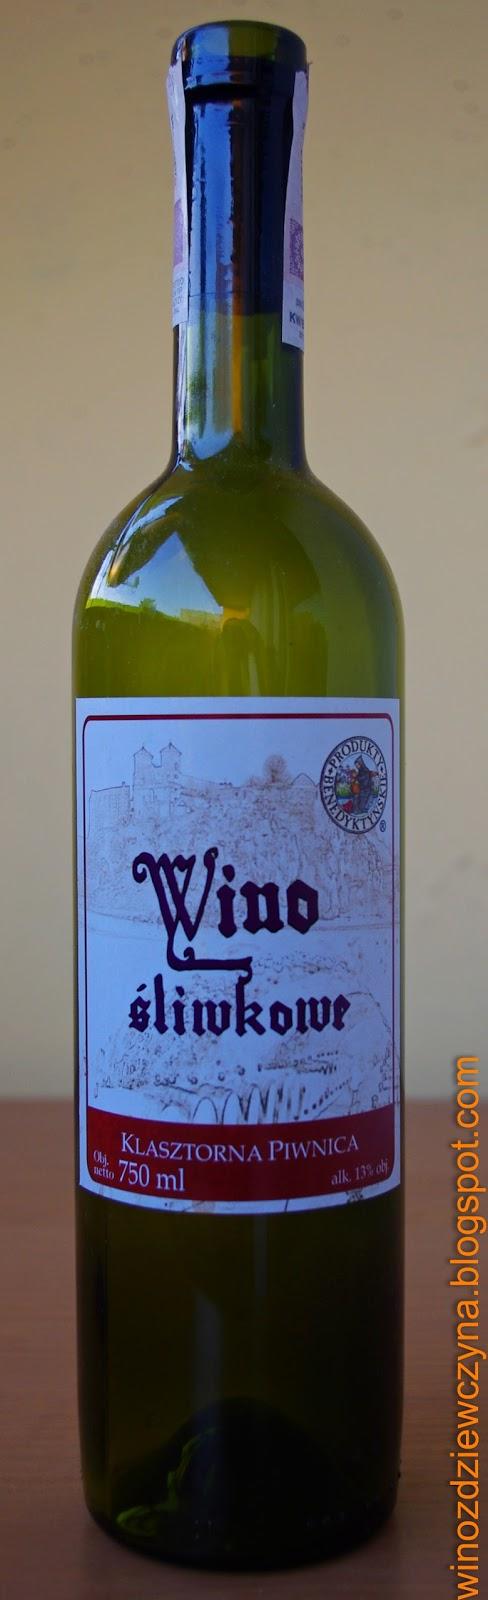 Wino Klasztorna Piwnica